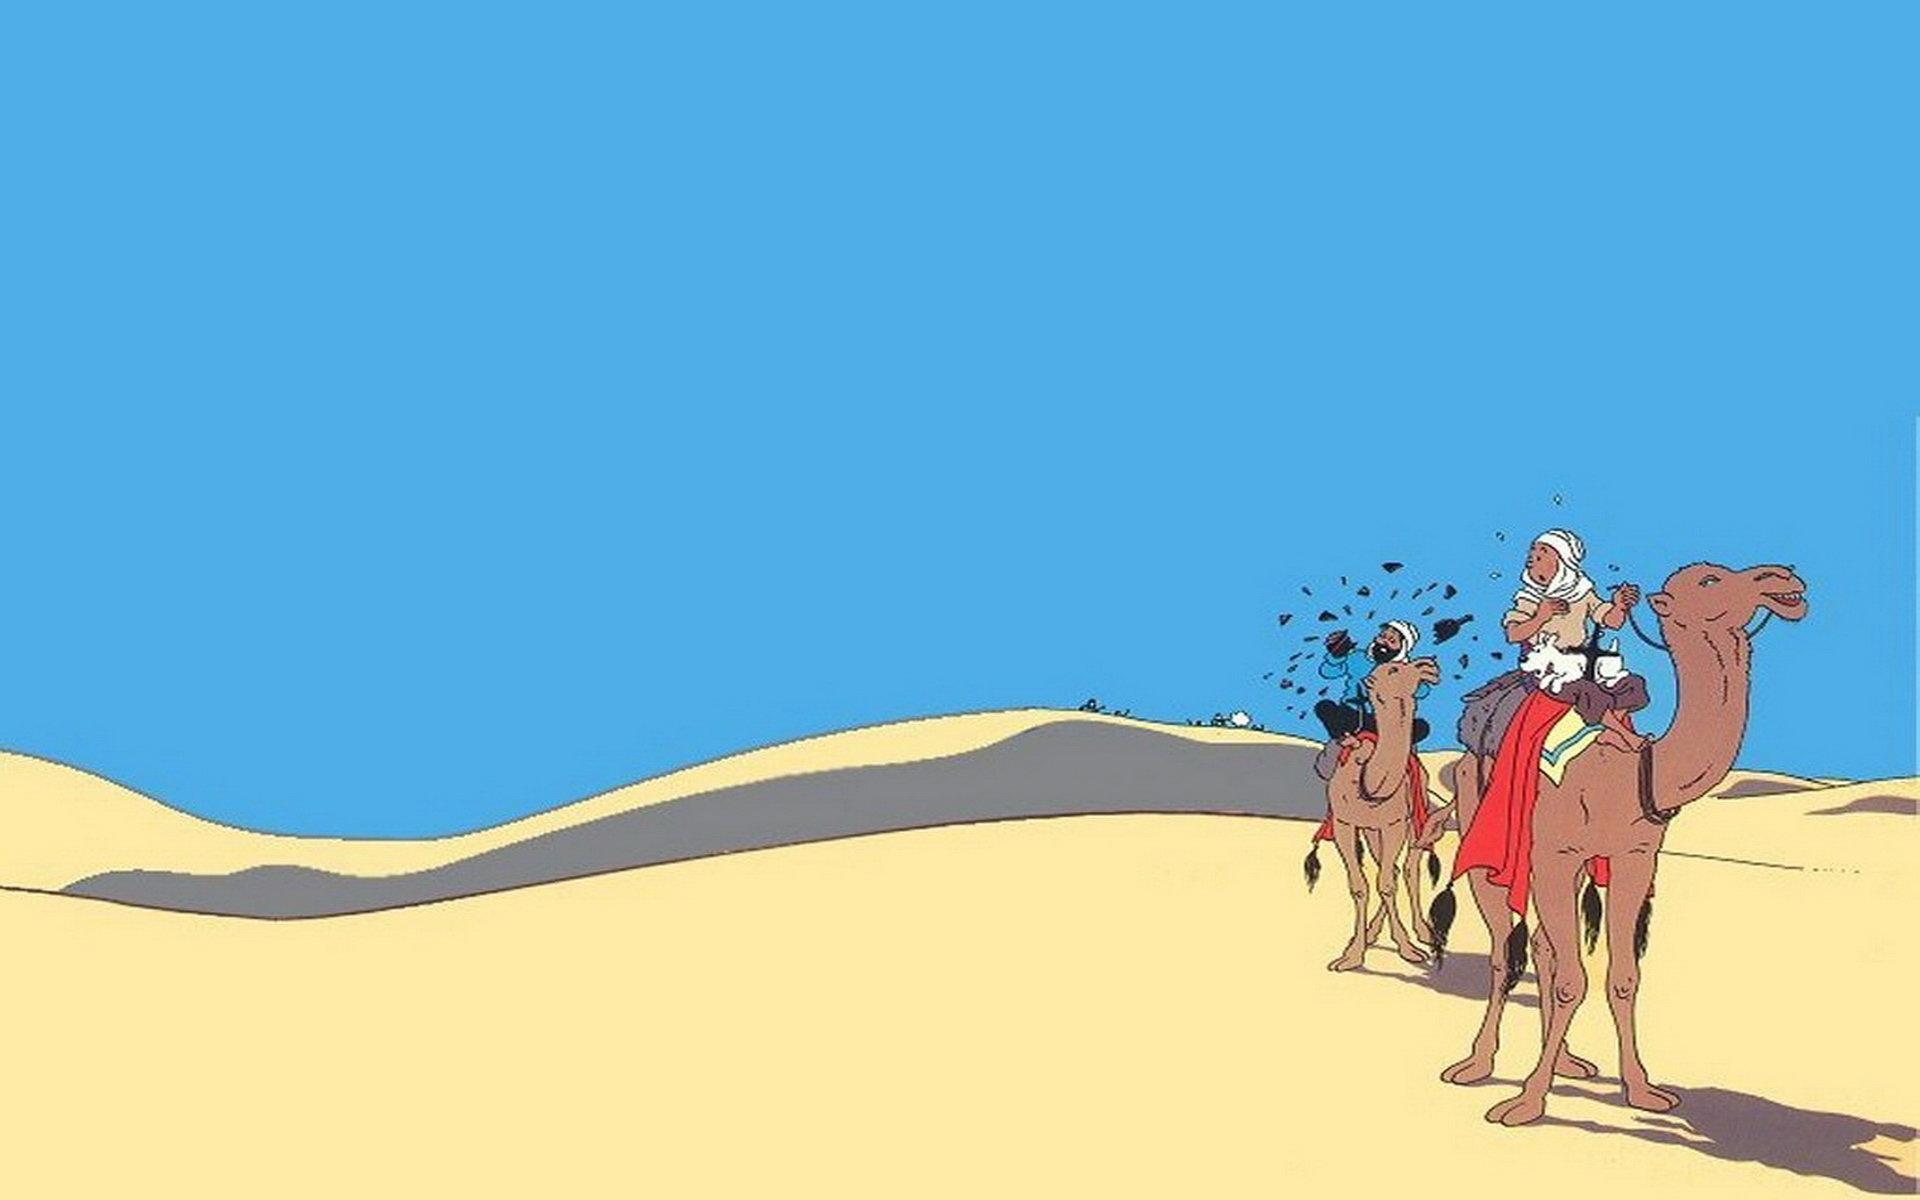 The Adventures Of Tintin wallpapers 1920x1200 desktop backgrounds